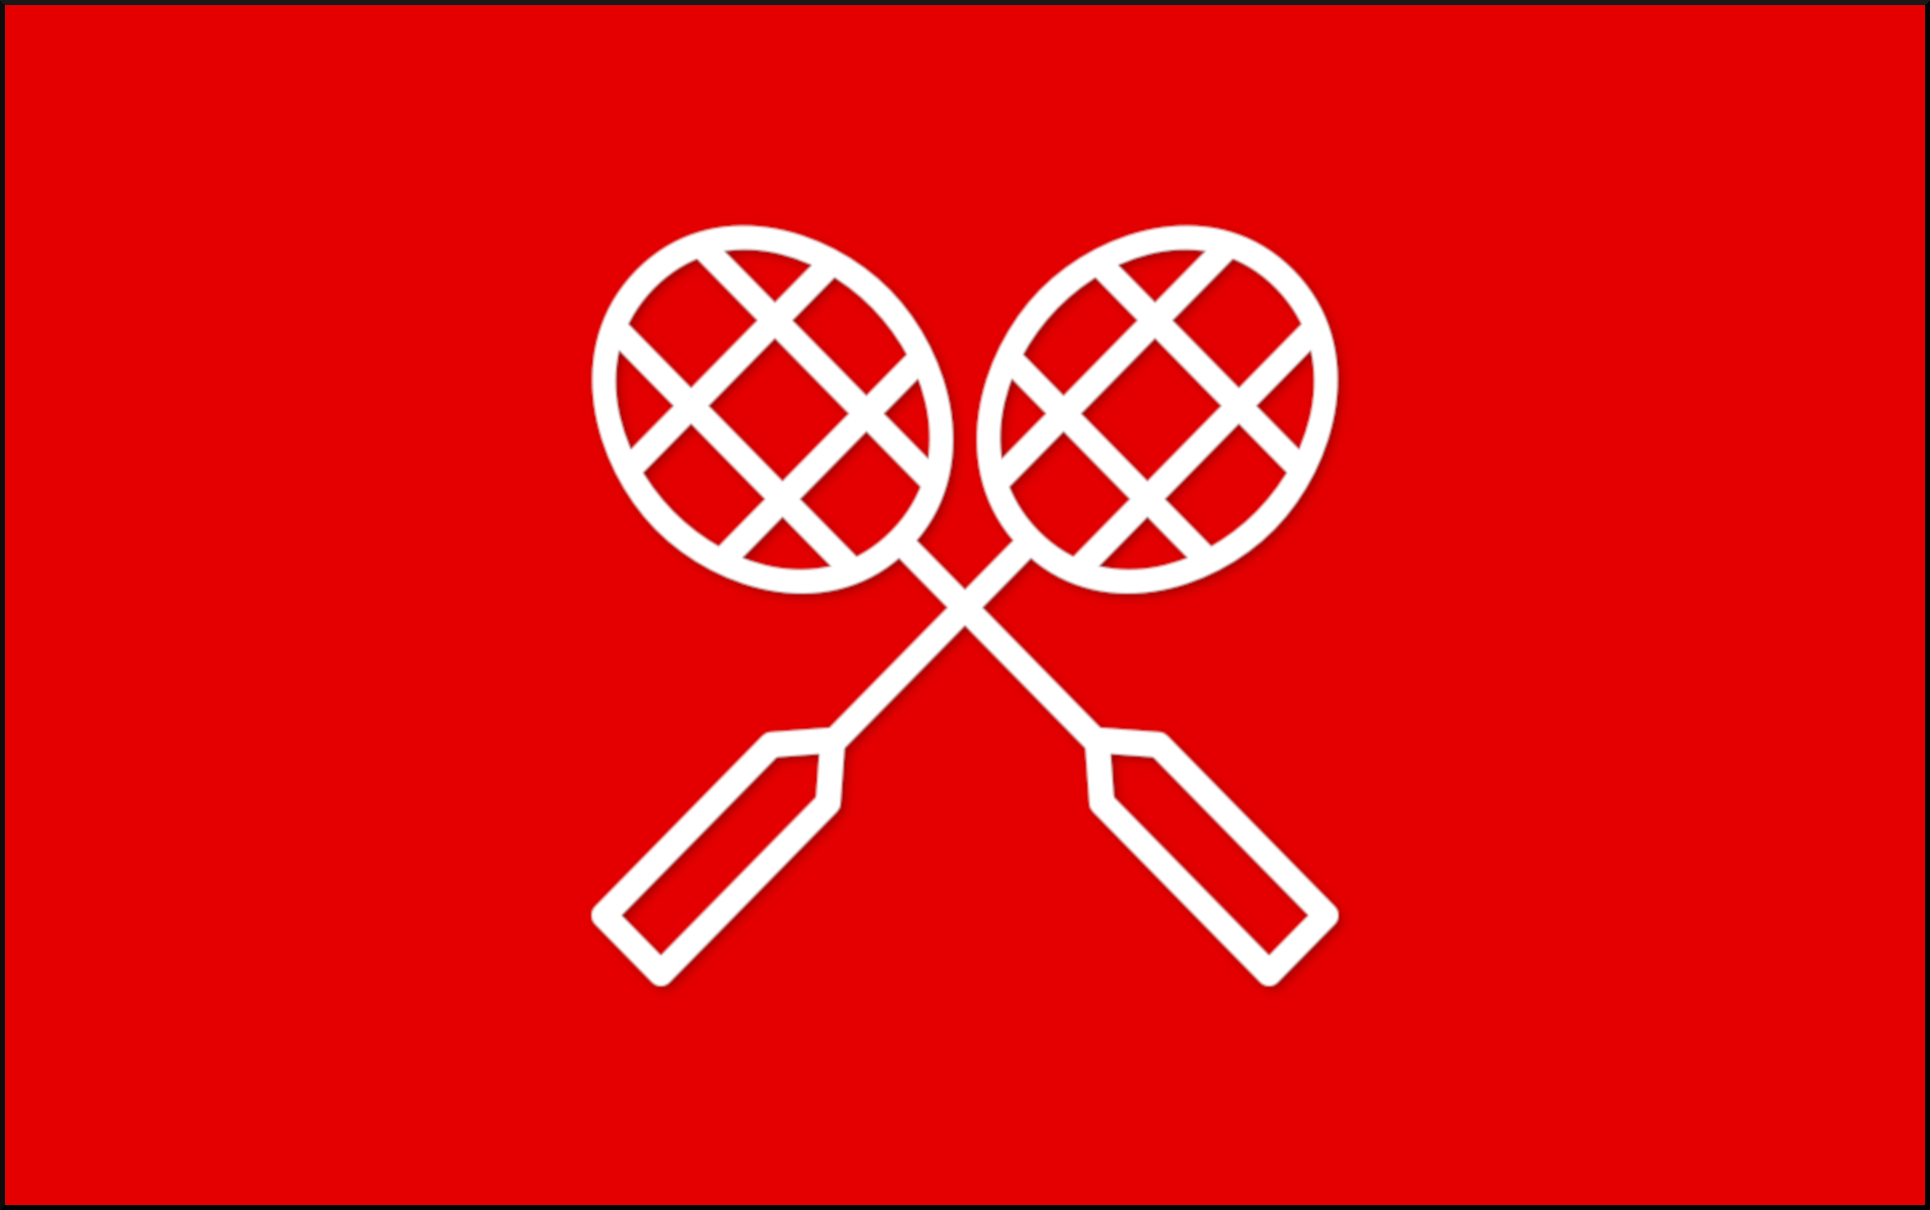 ploneour-badminton-image-defaut.jpg